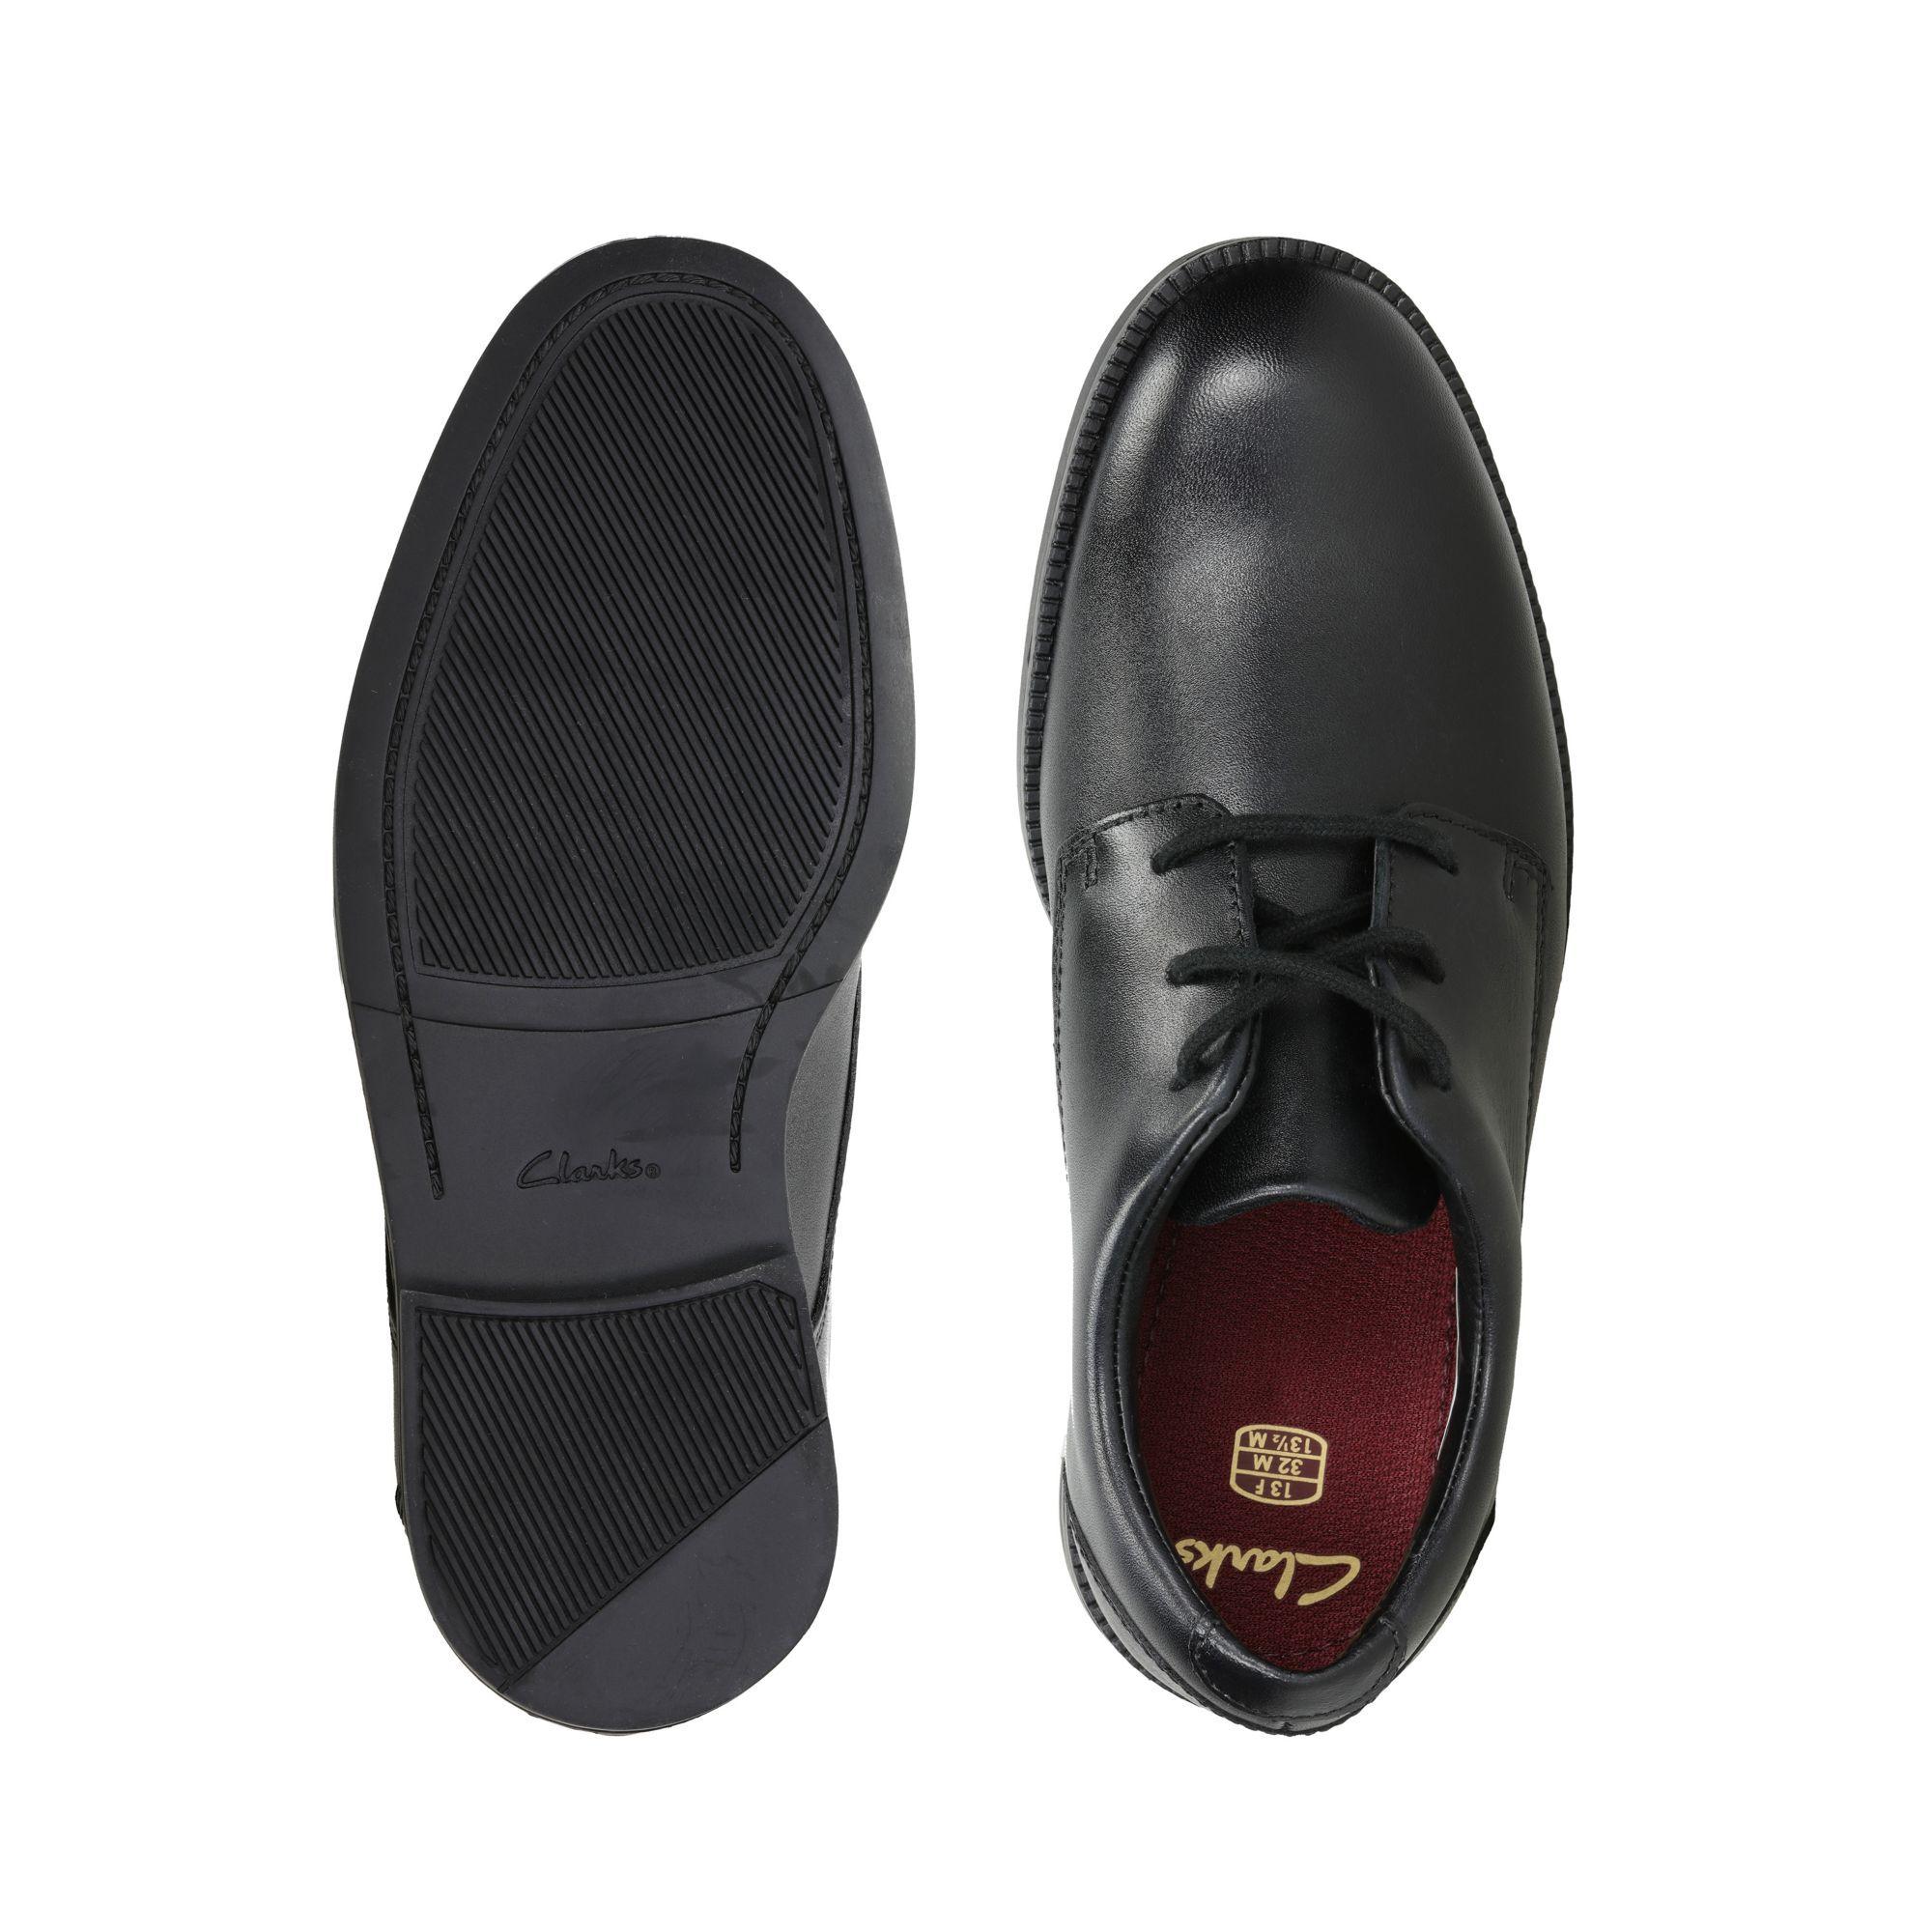 Black Leather Shoes - Rufus Edge   Clarks